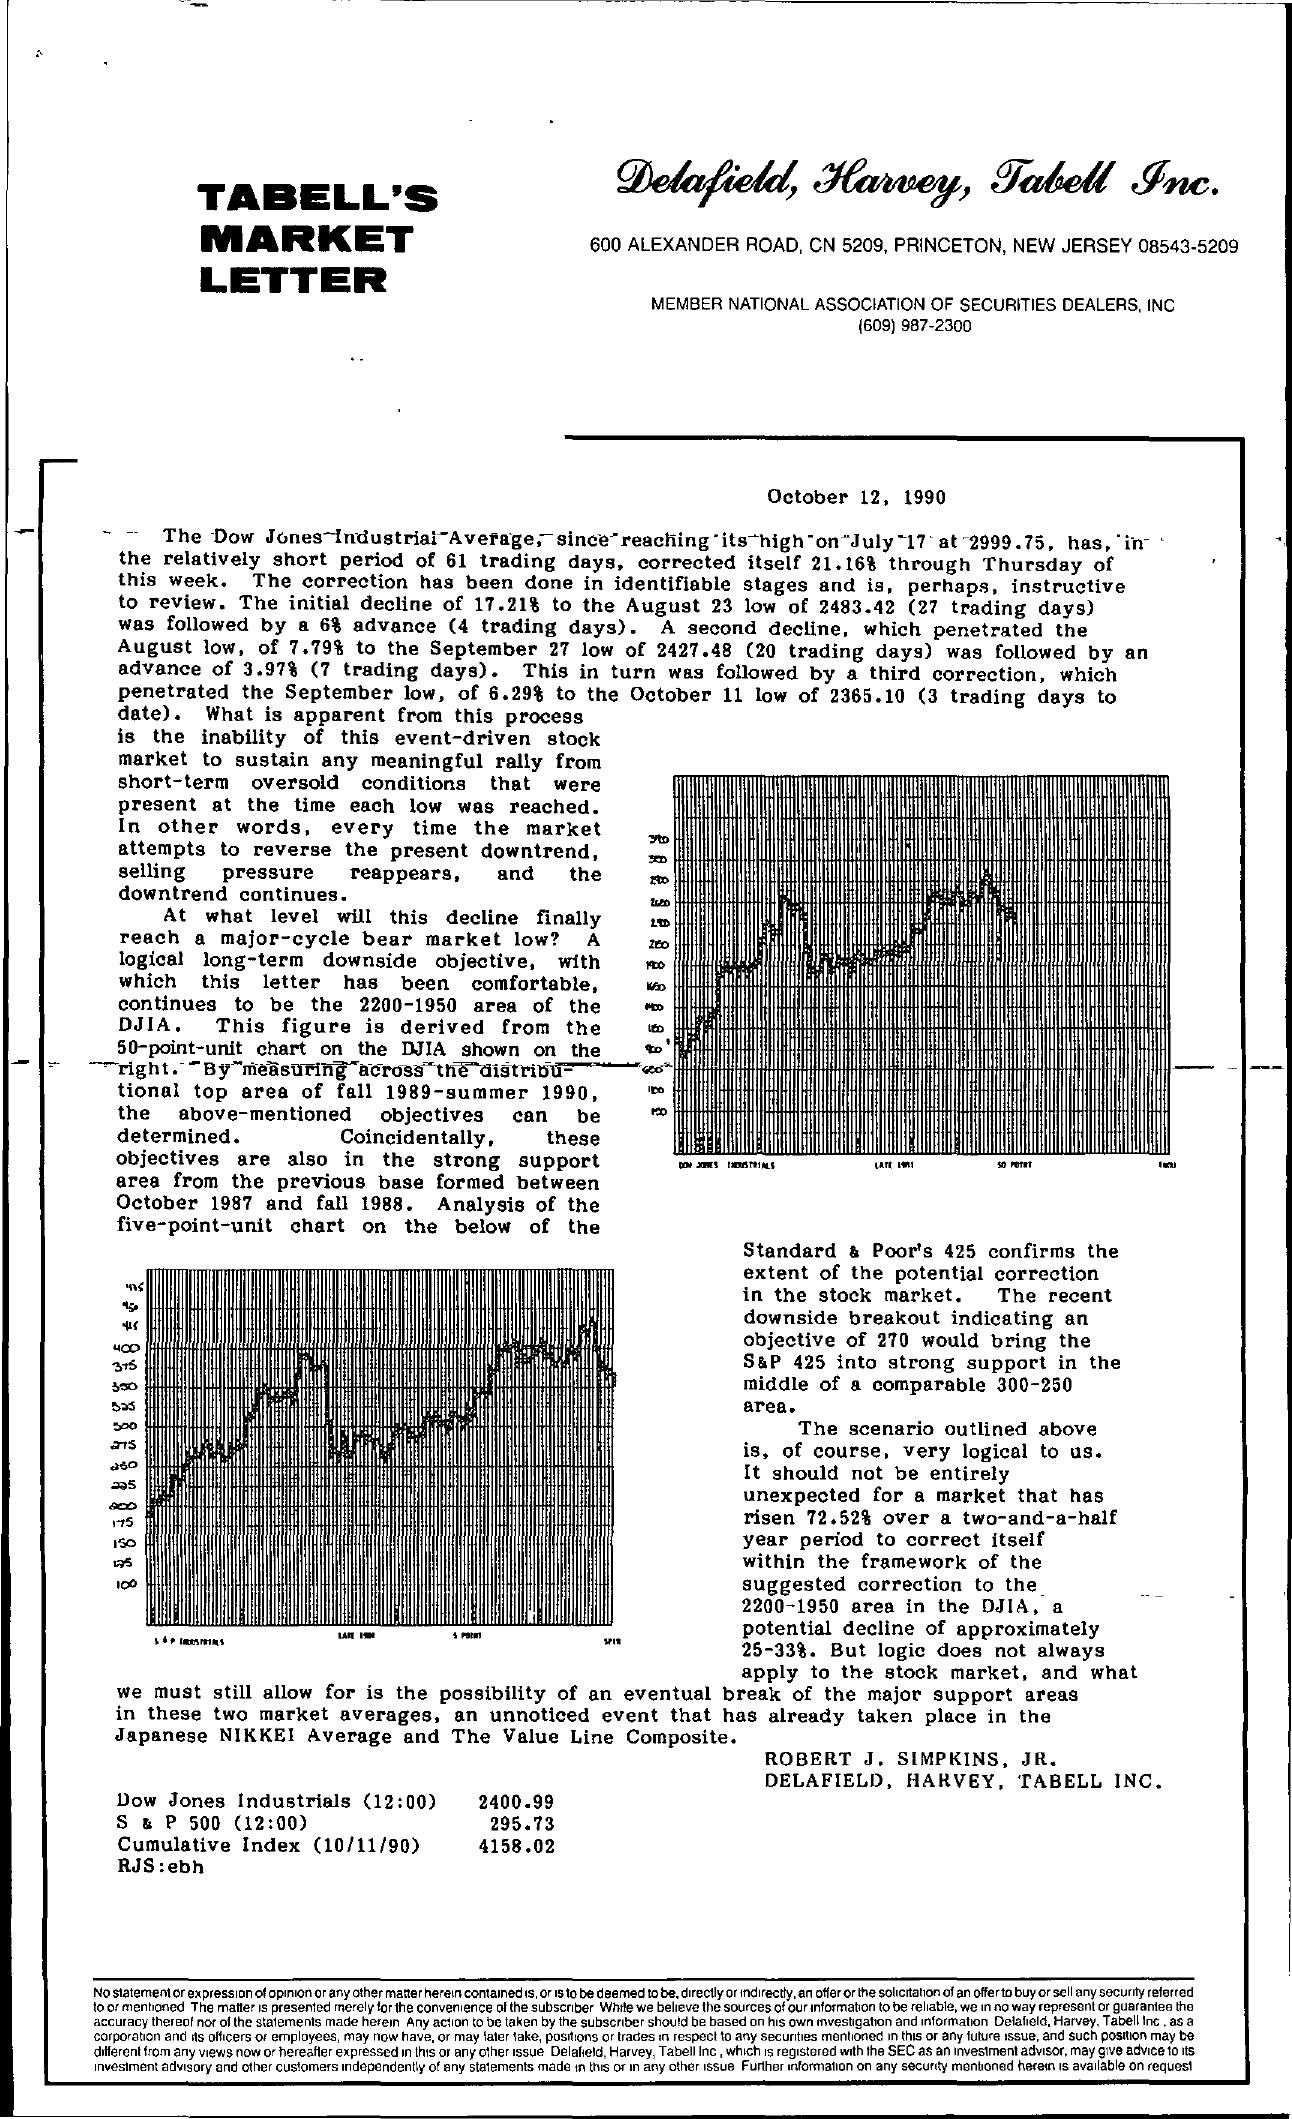 Tabell's Market Letter - October 12, 1990